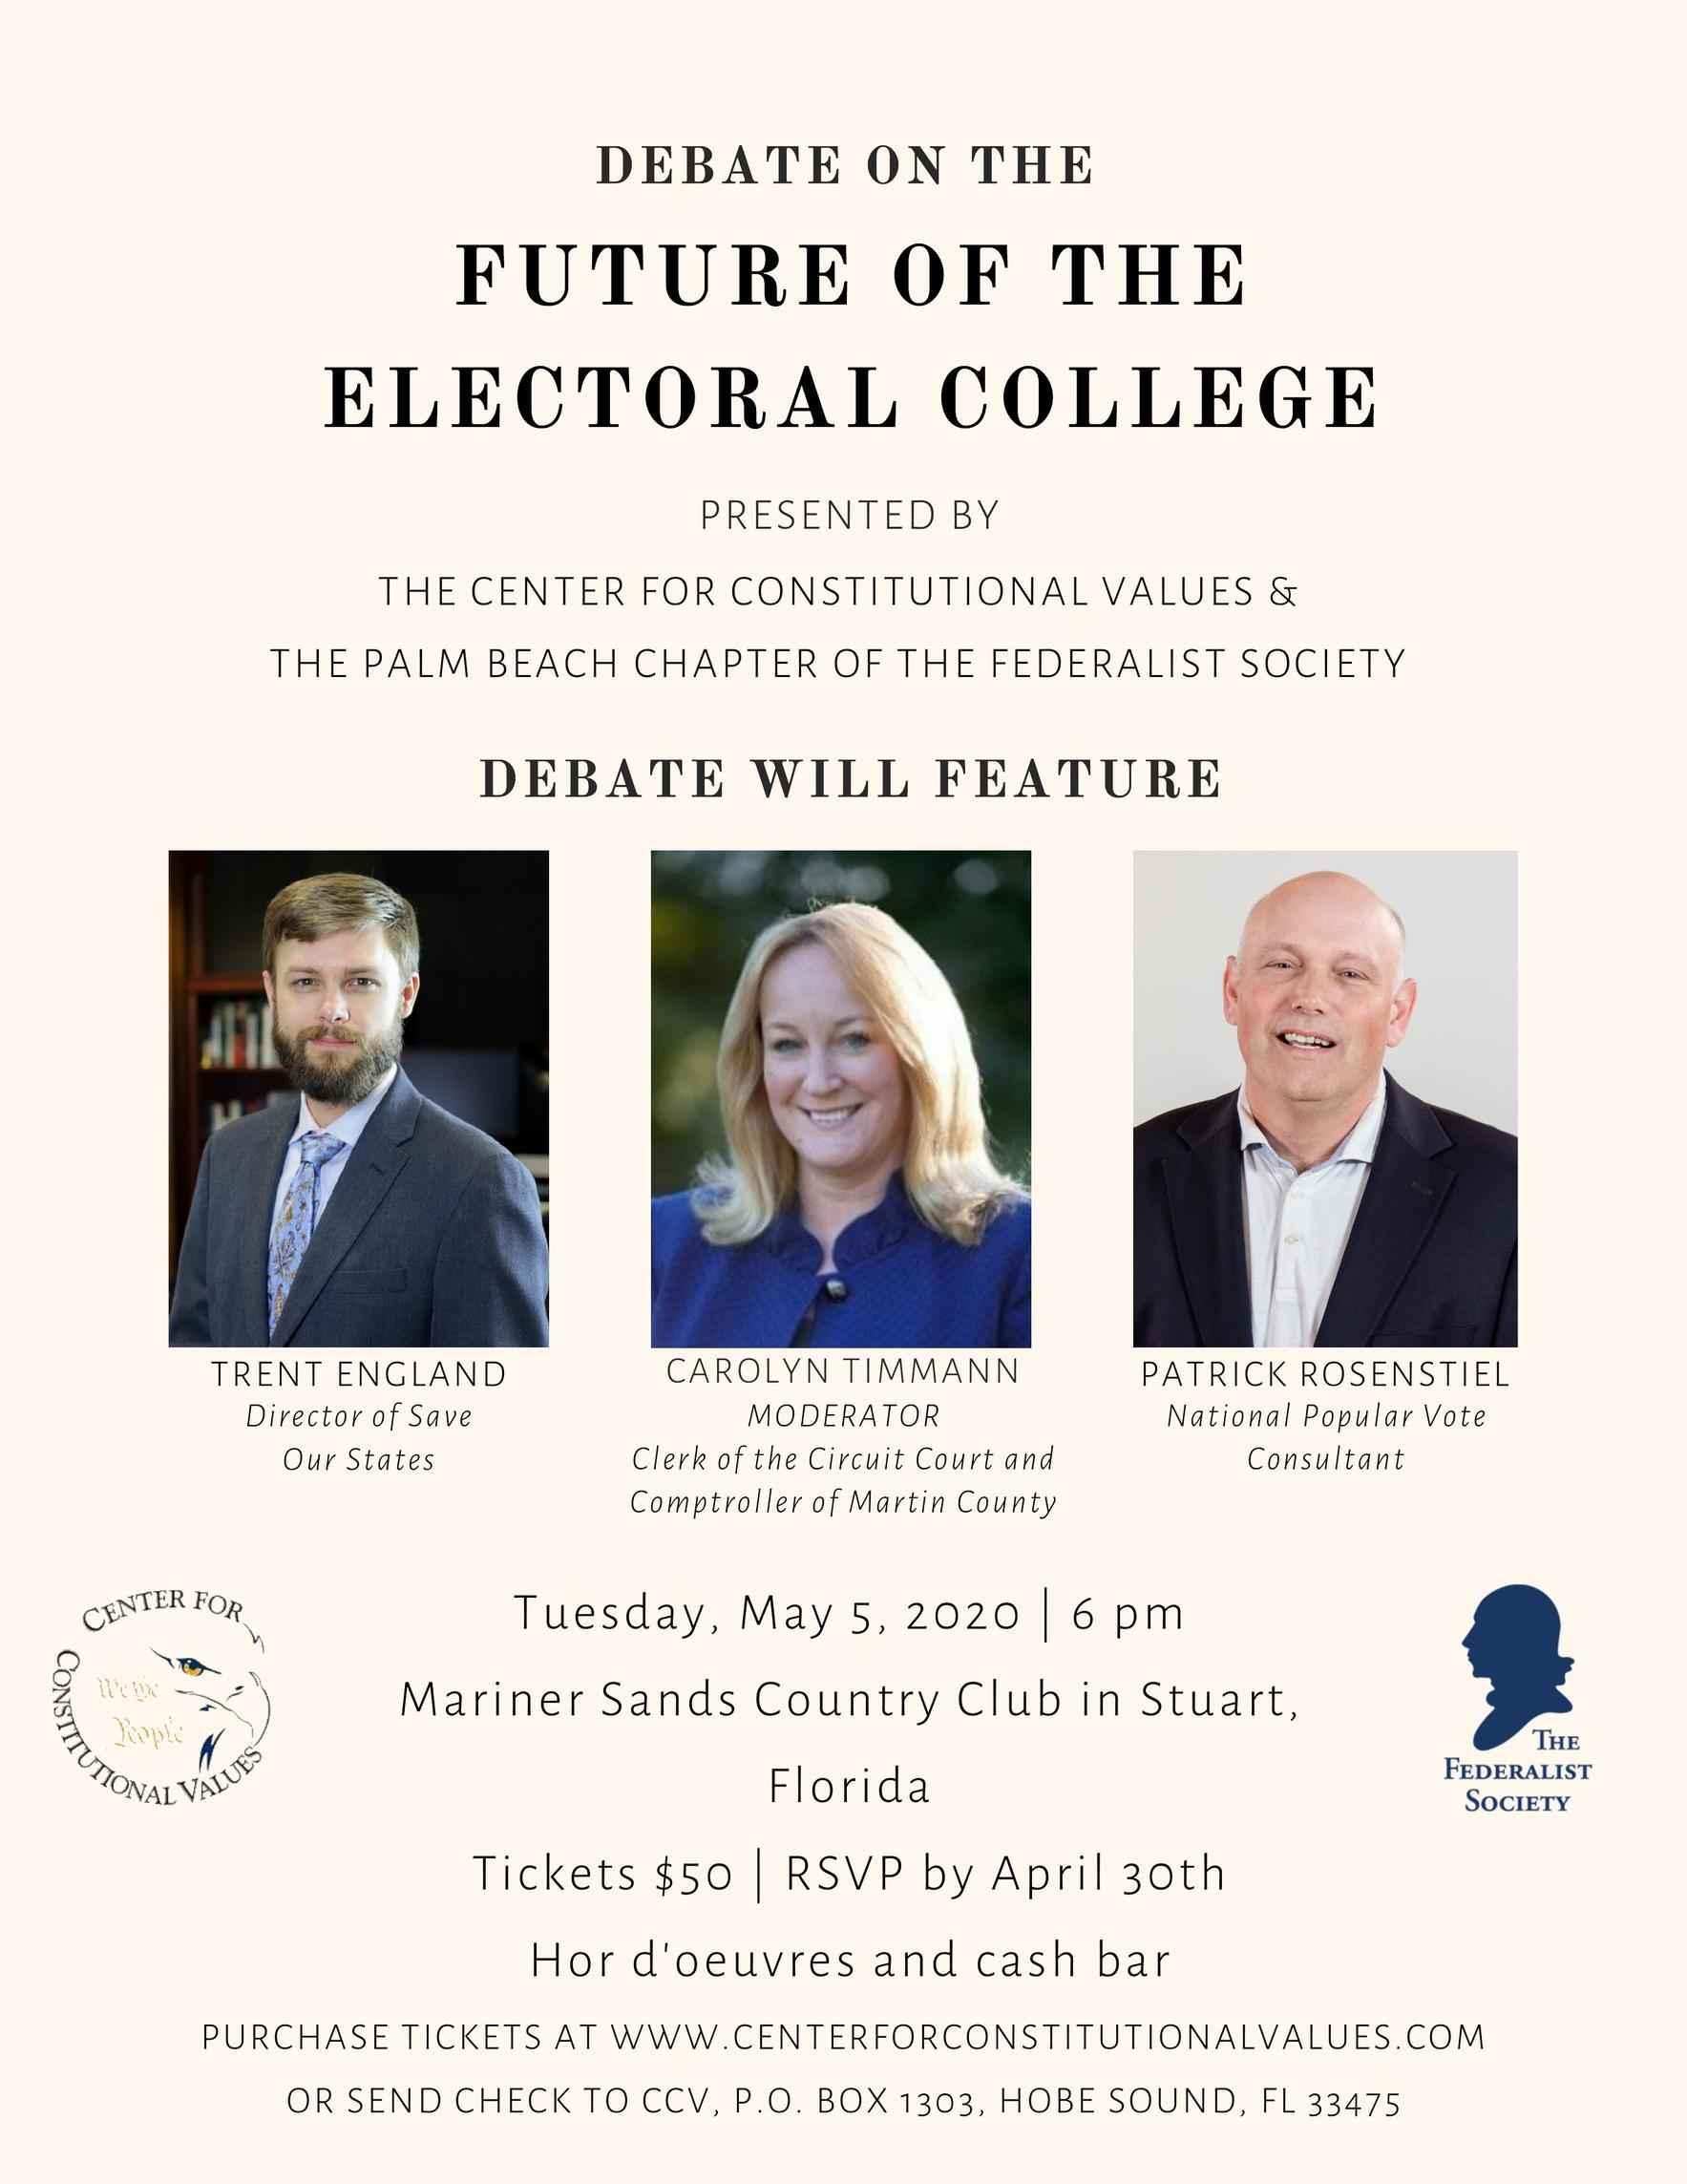 Electoral College Debate image